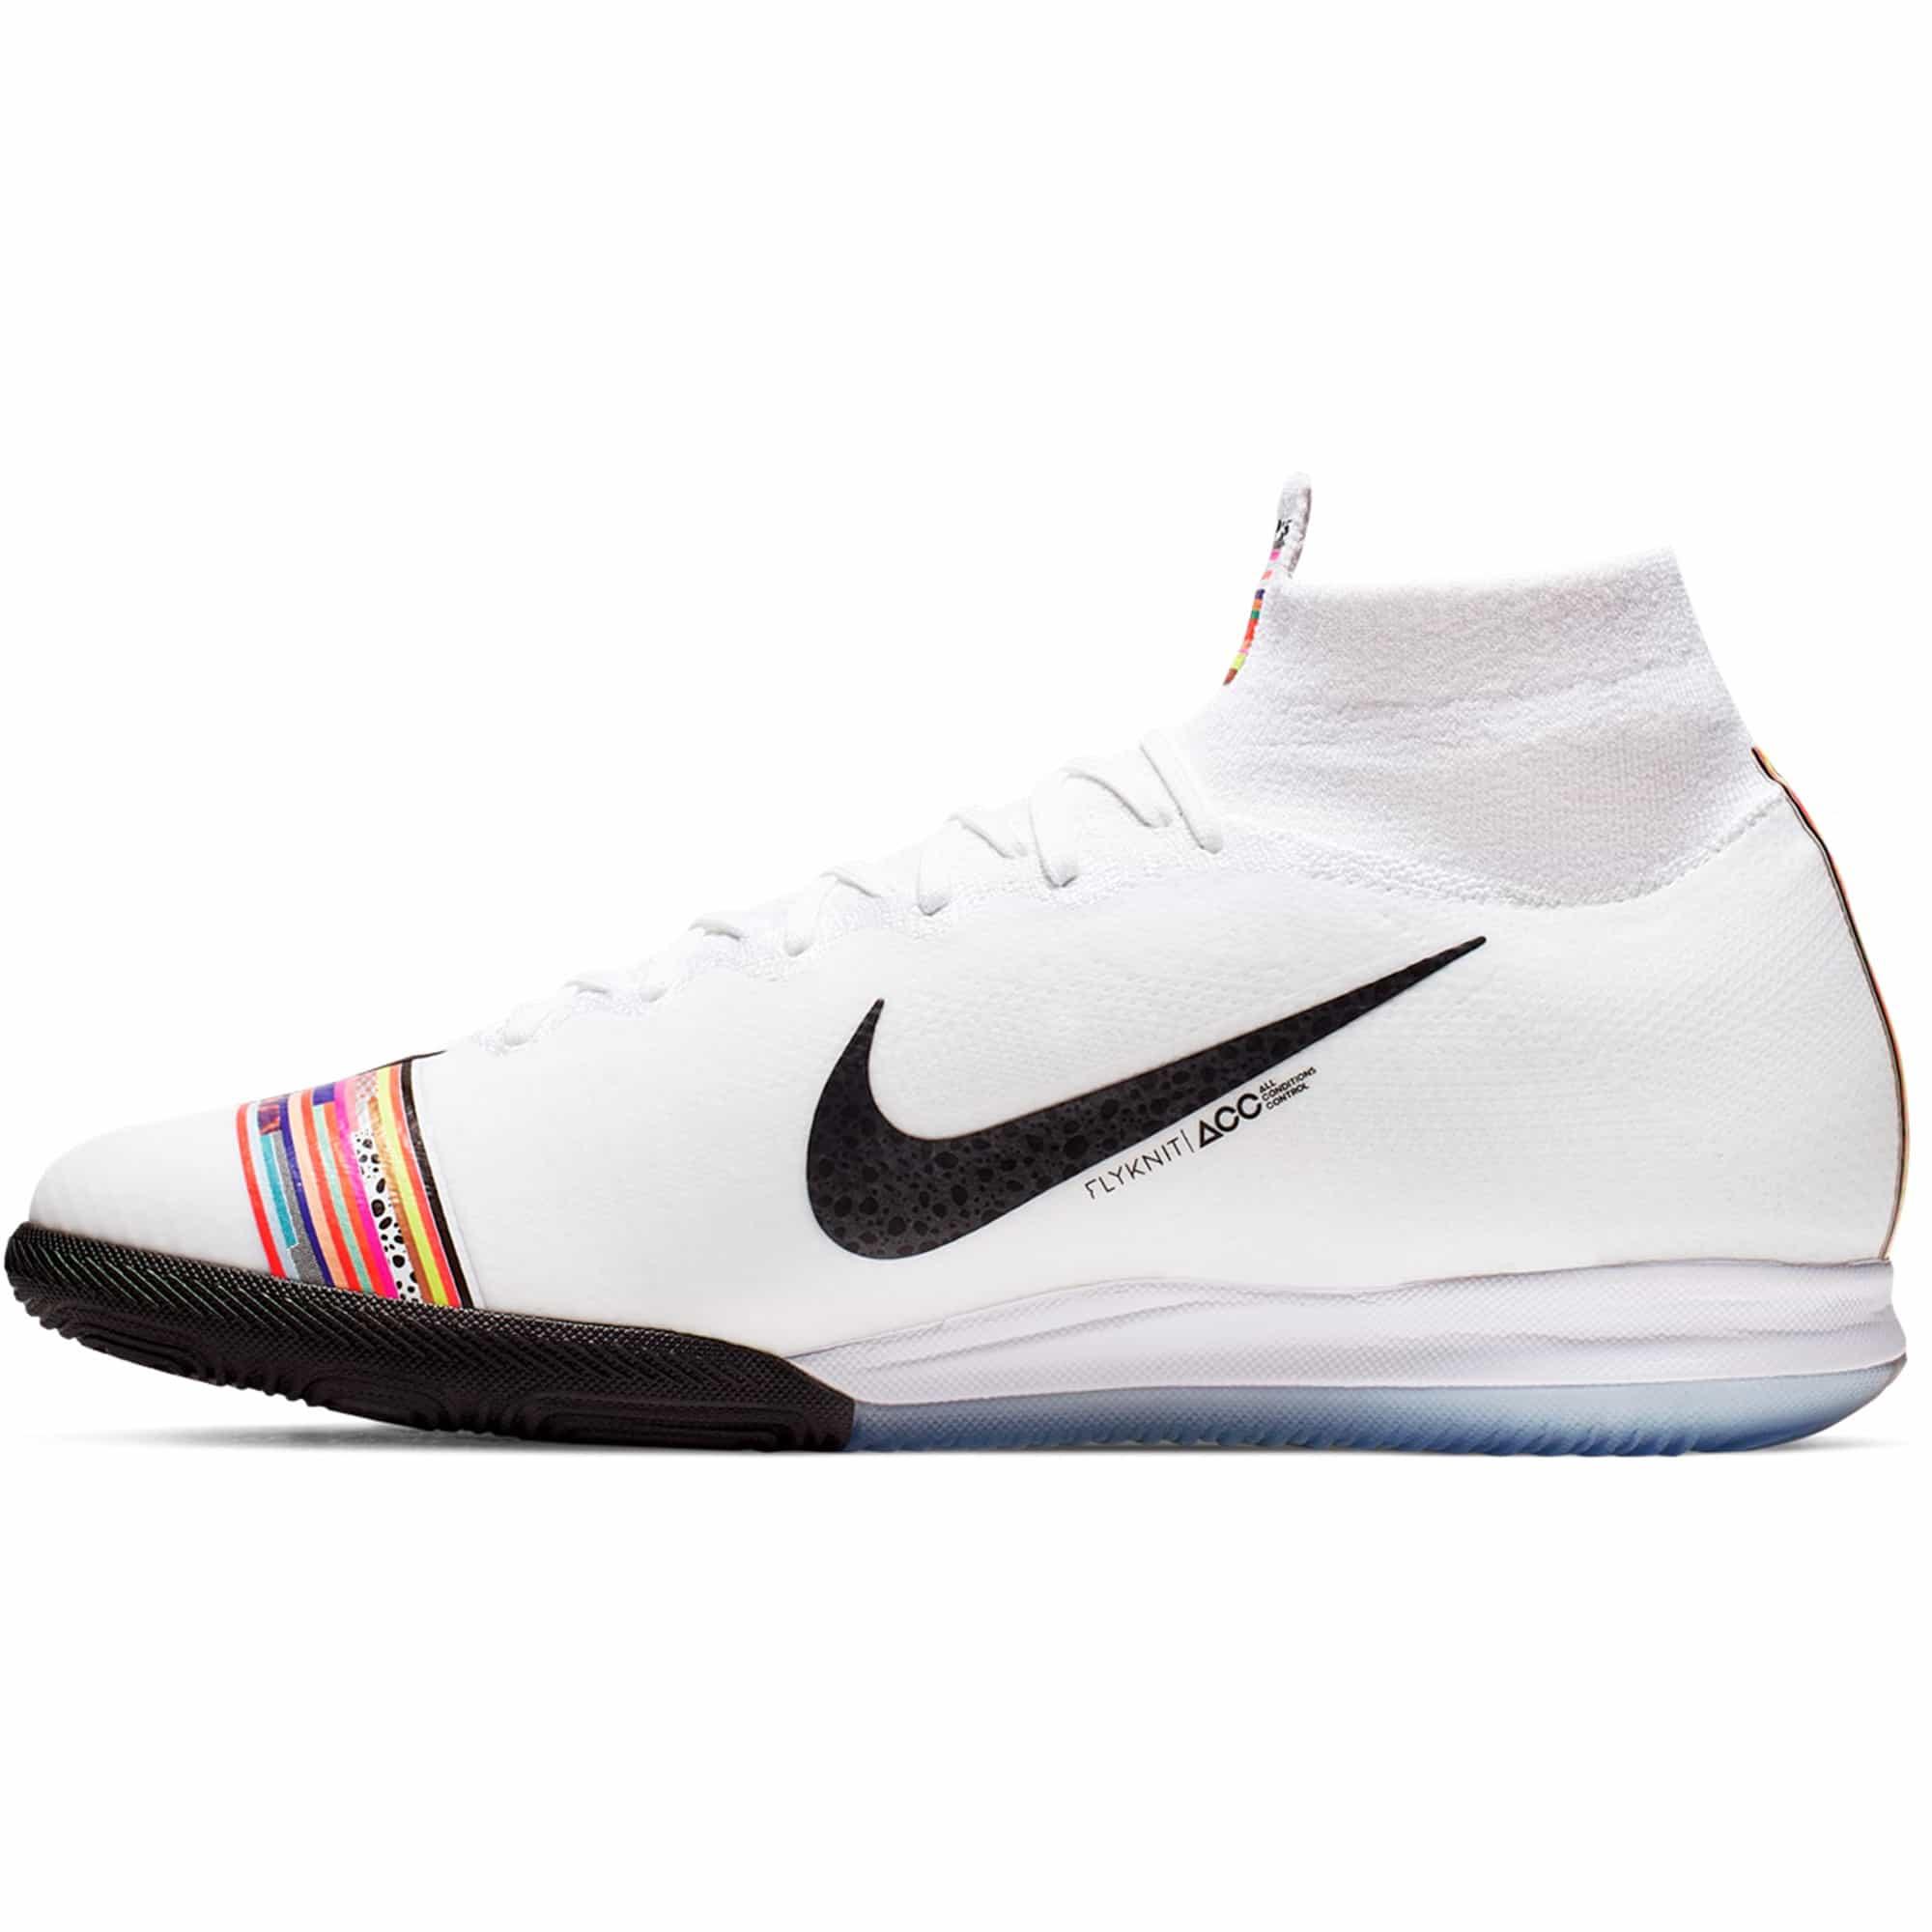 2f78604c0db Home   Brand   Nike   Nike Mercurial Superfly X VI Elite SE IC Indoor Soccer  ...